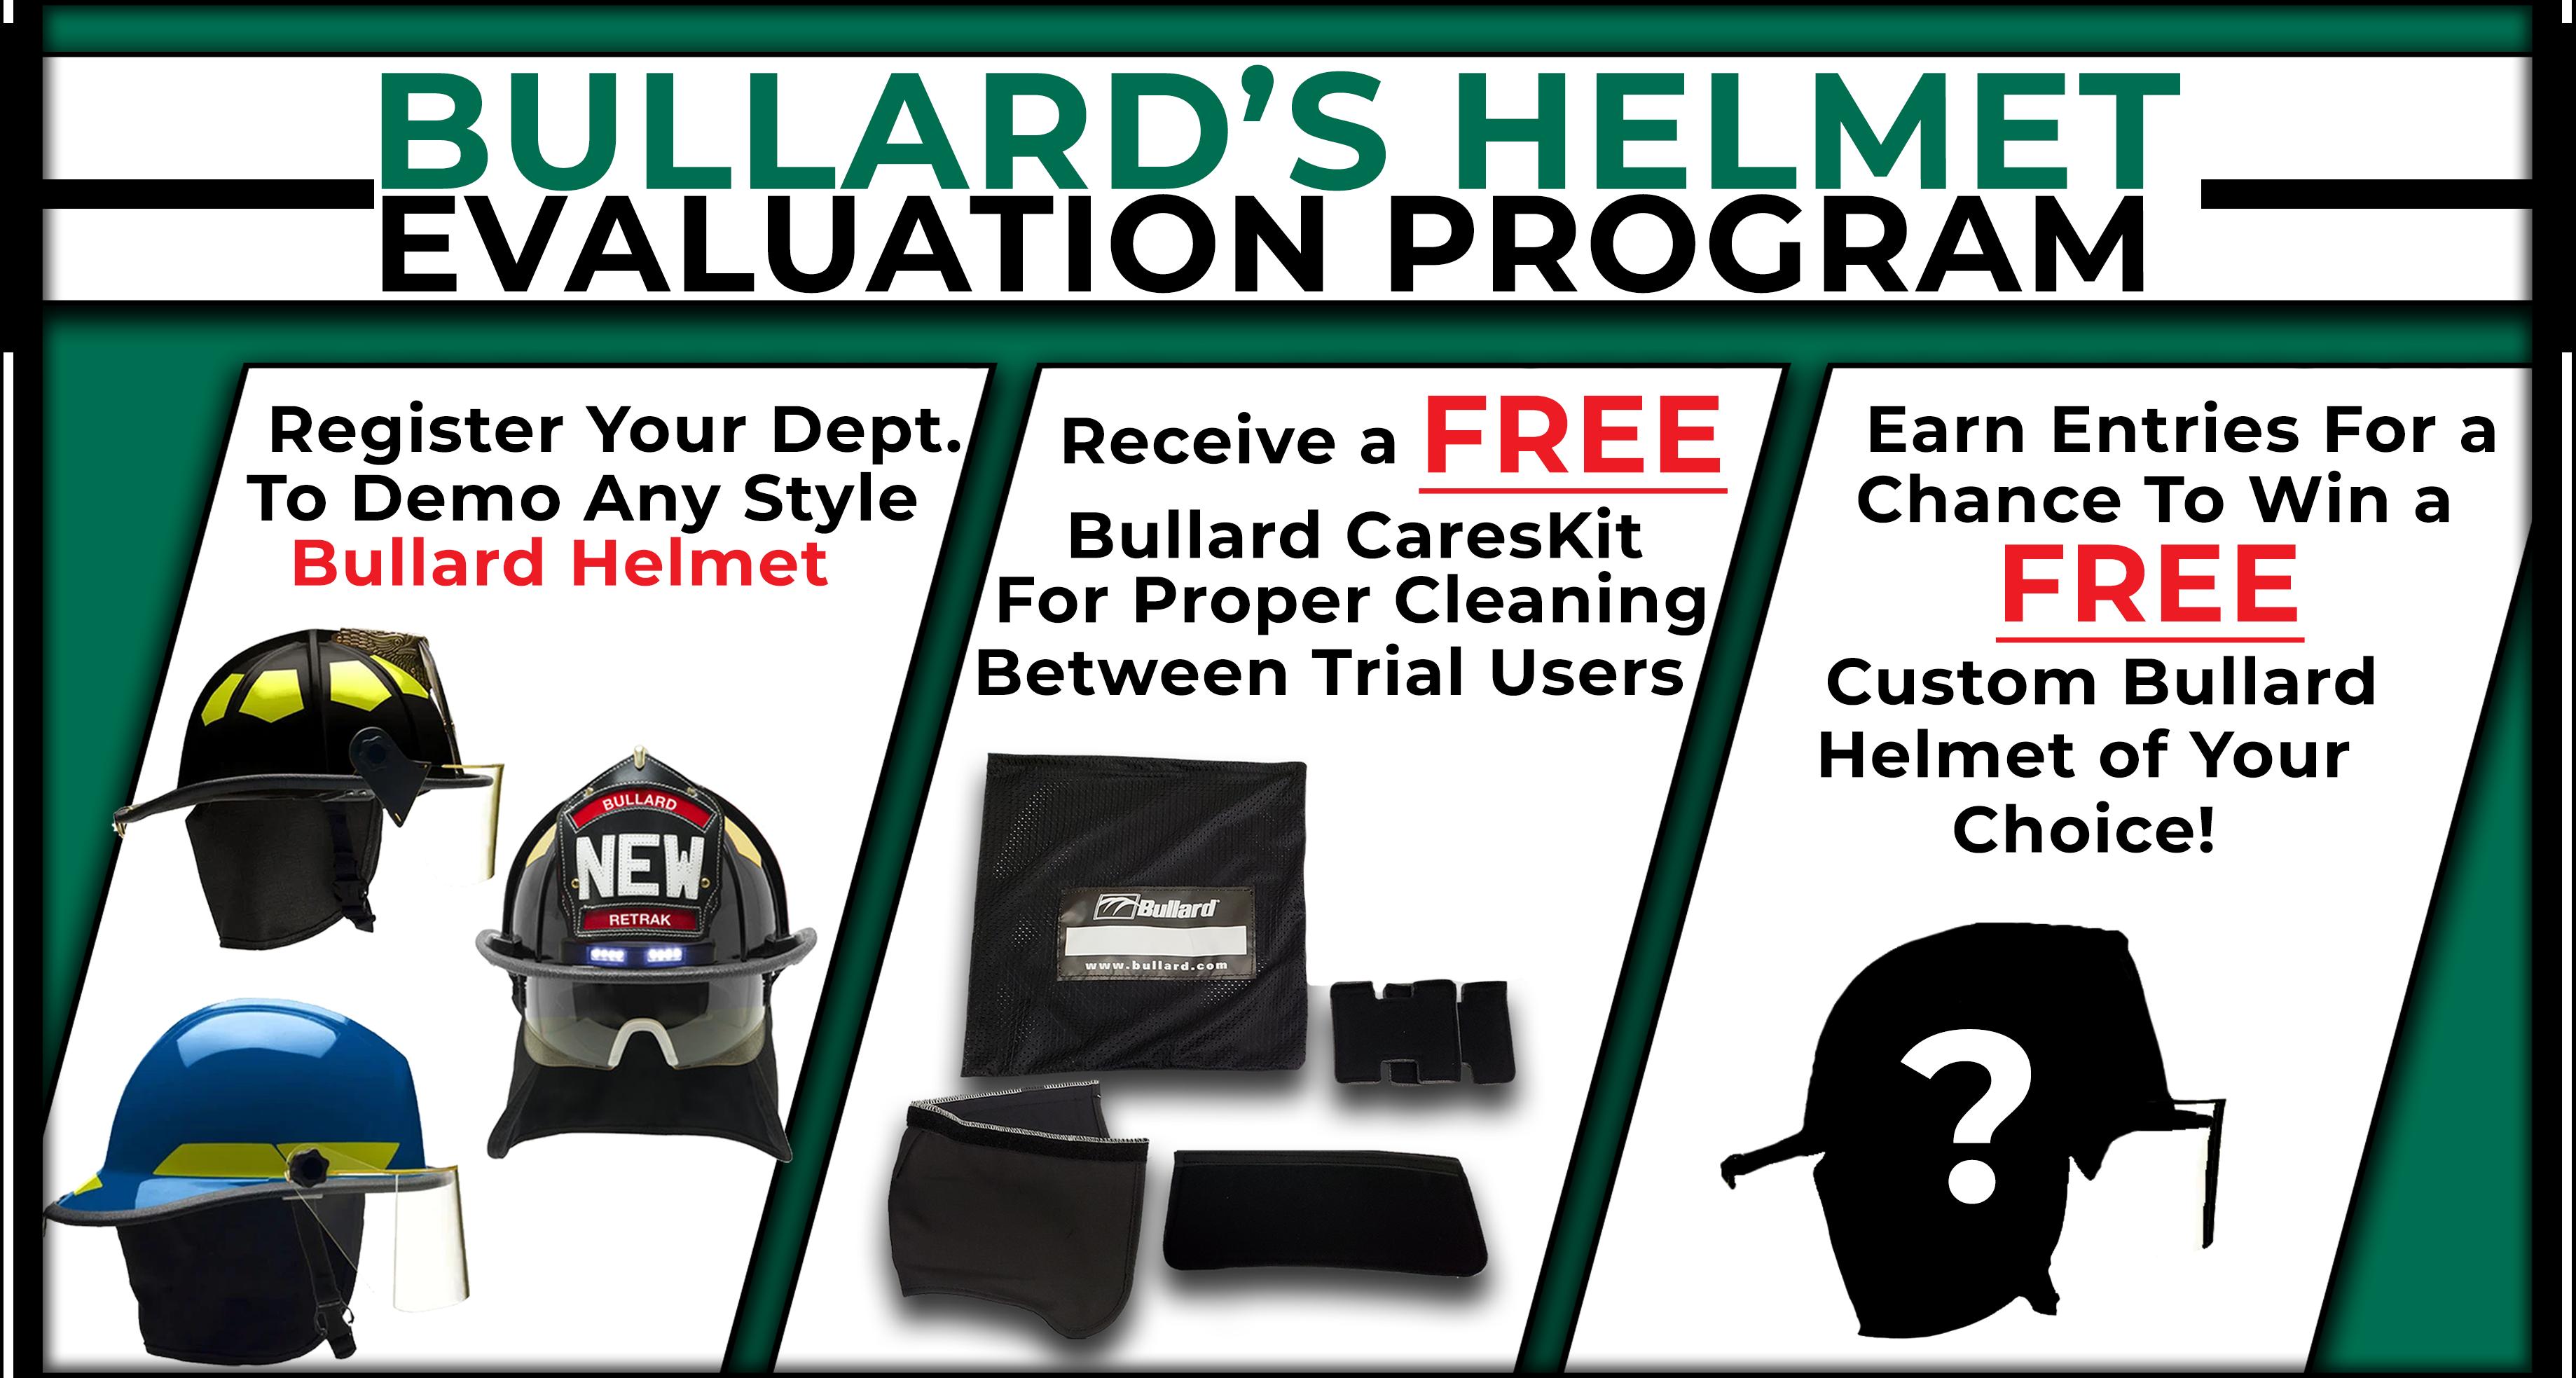 Bullard Helmet Evaluation Program